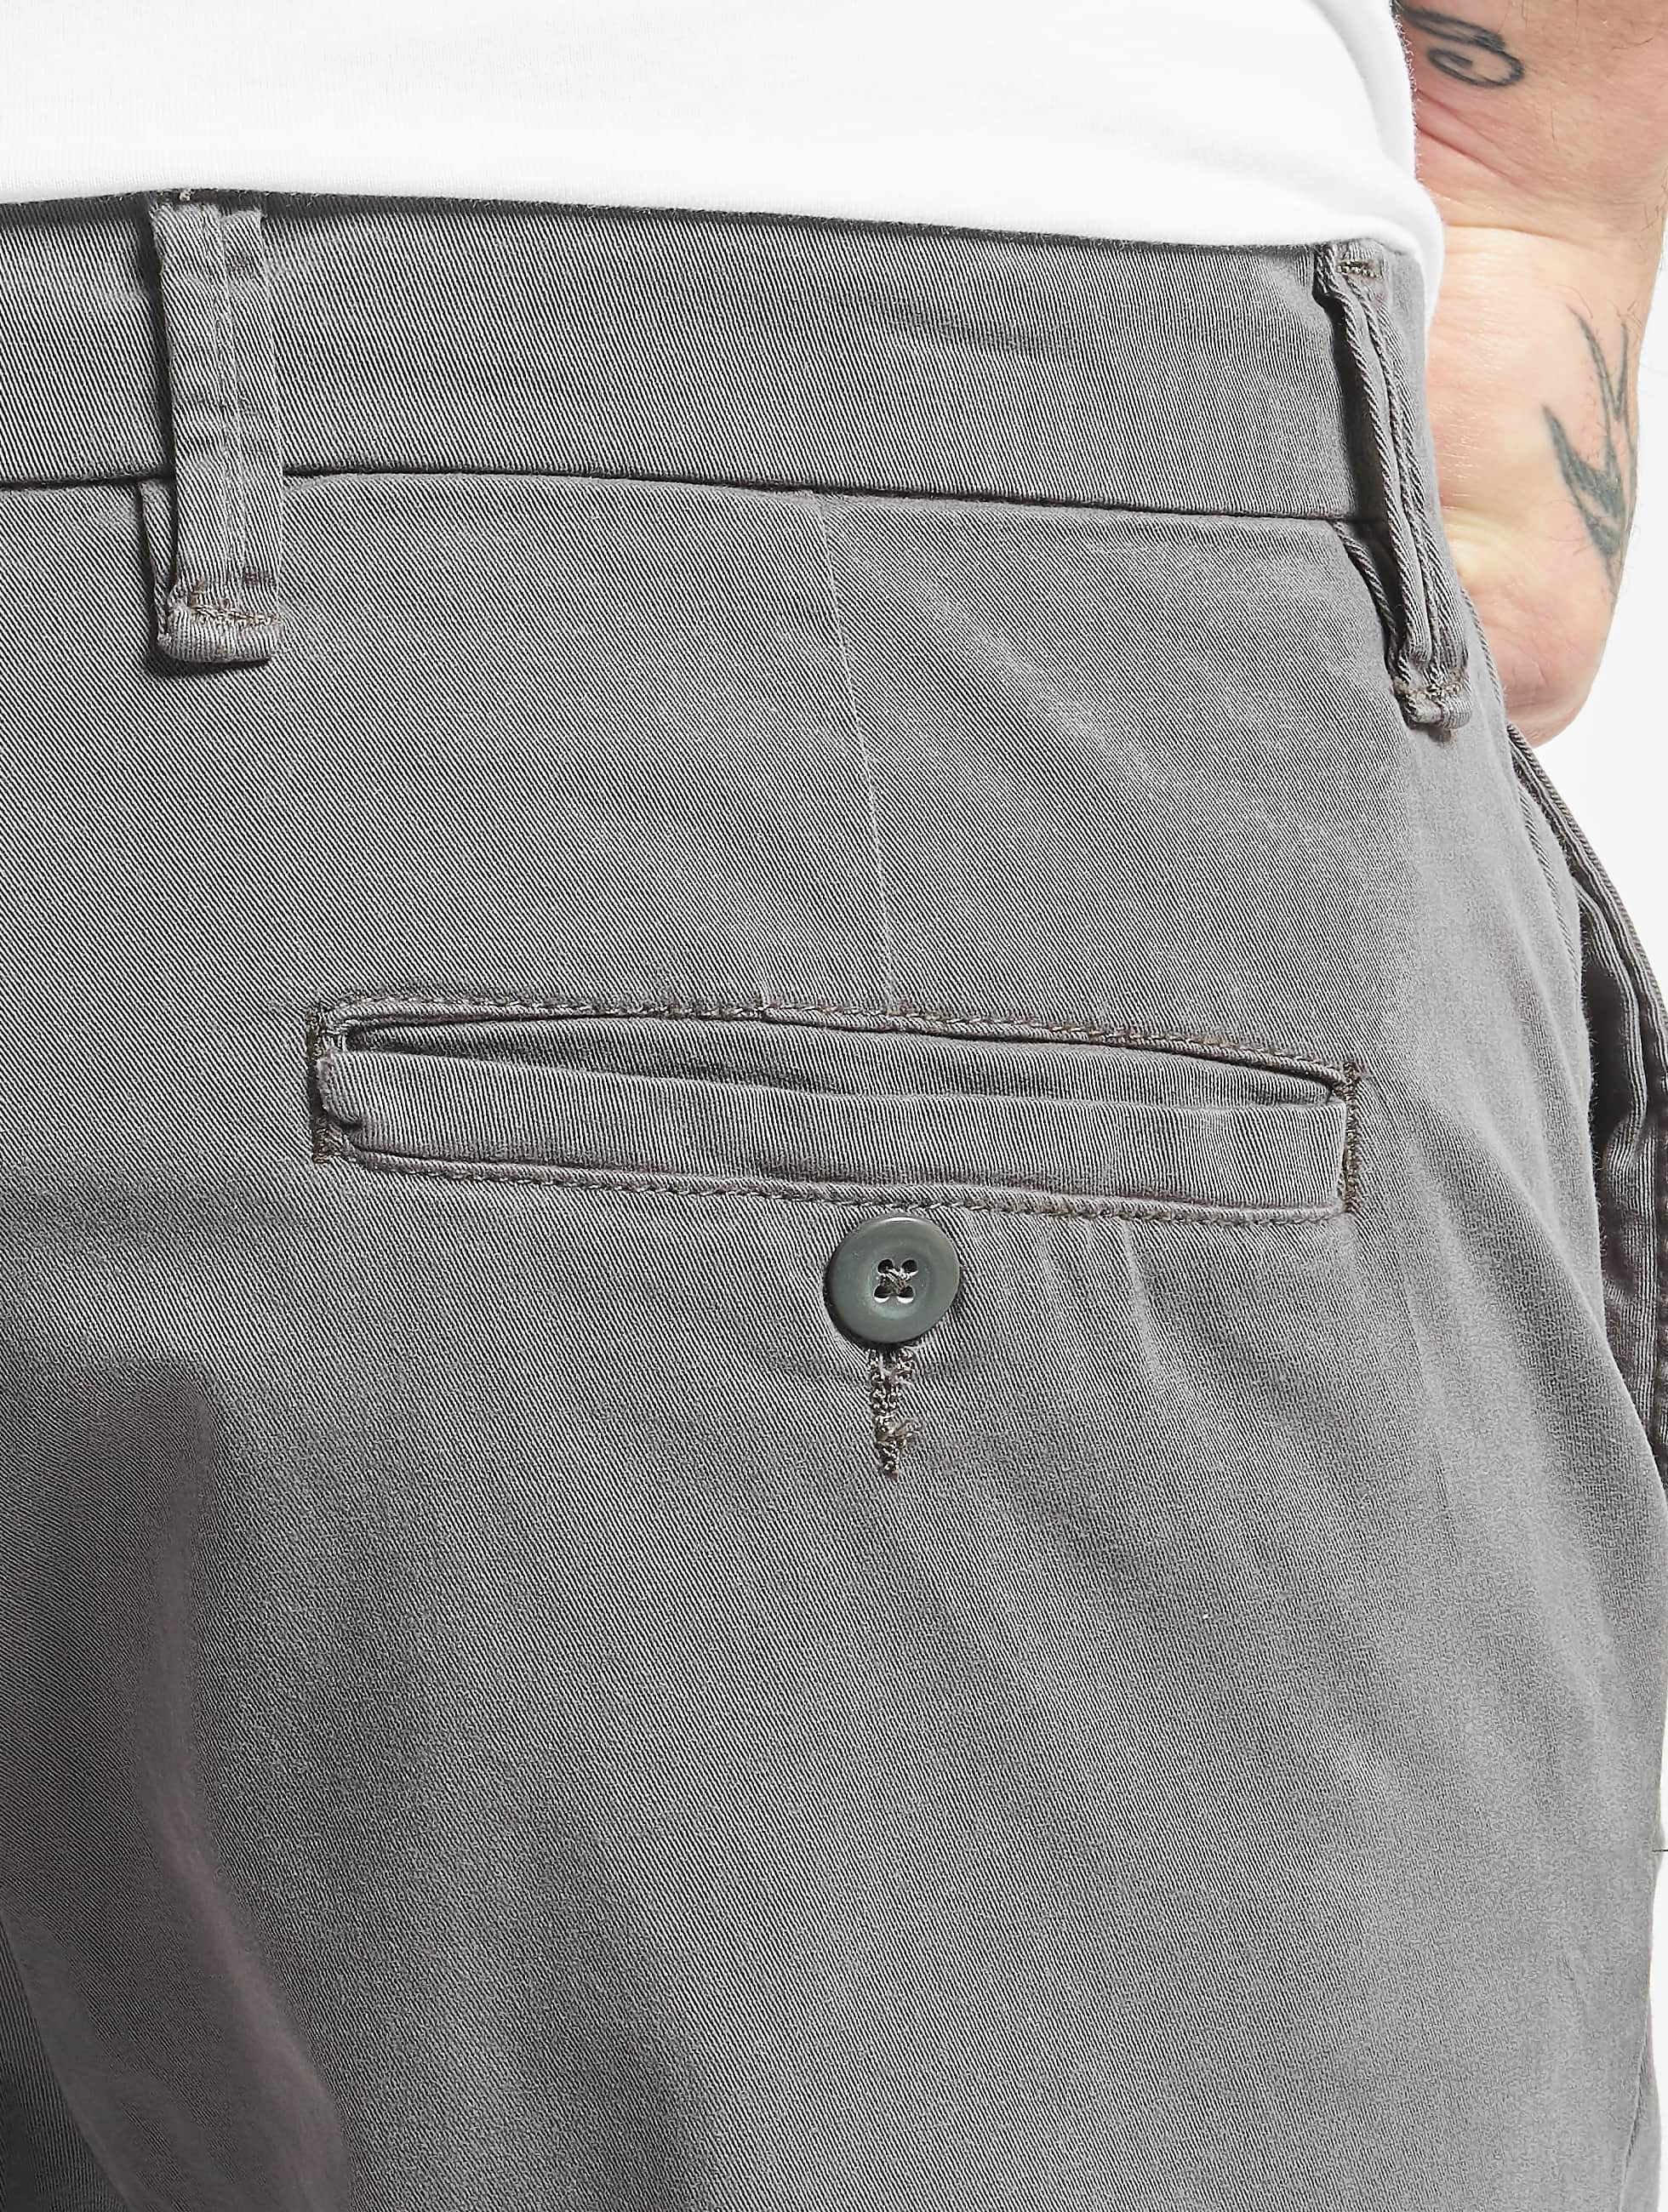 Urban Classics Short Stretch Turnup Chino grey